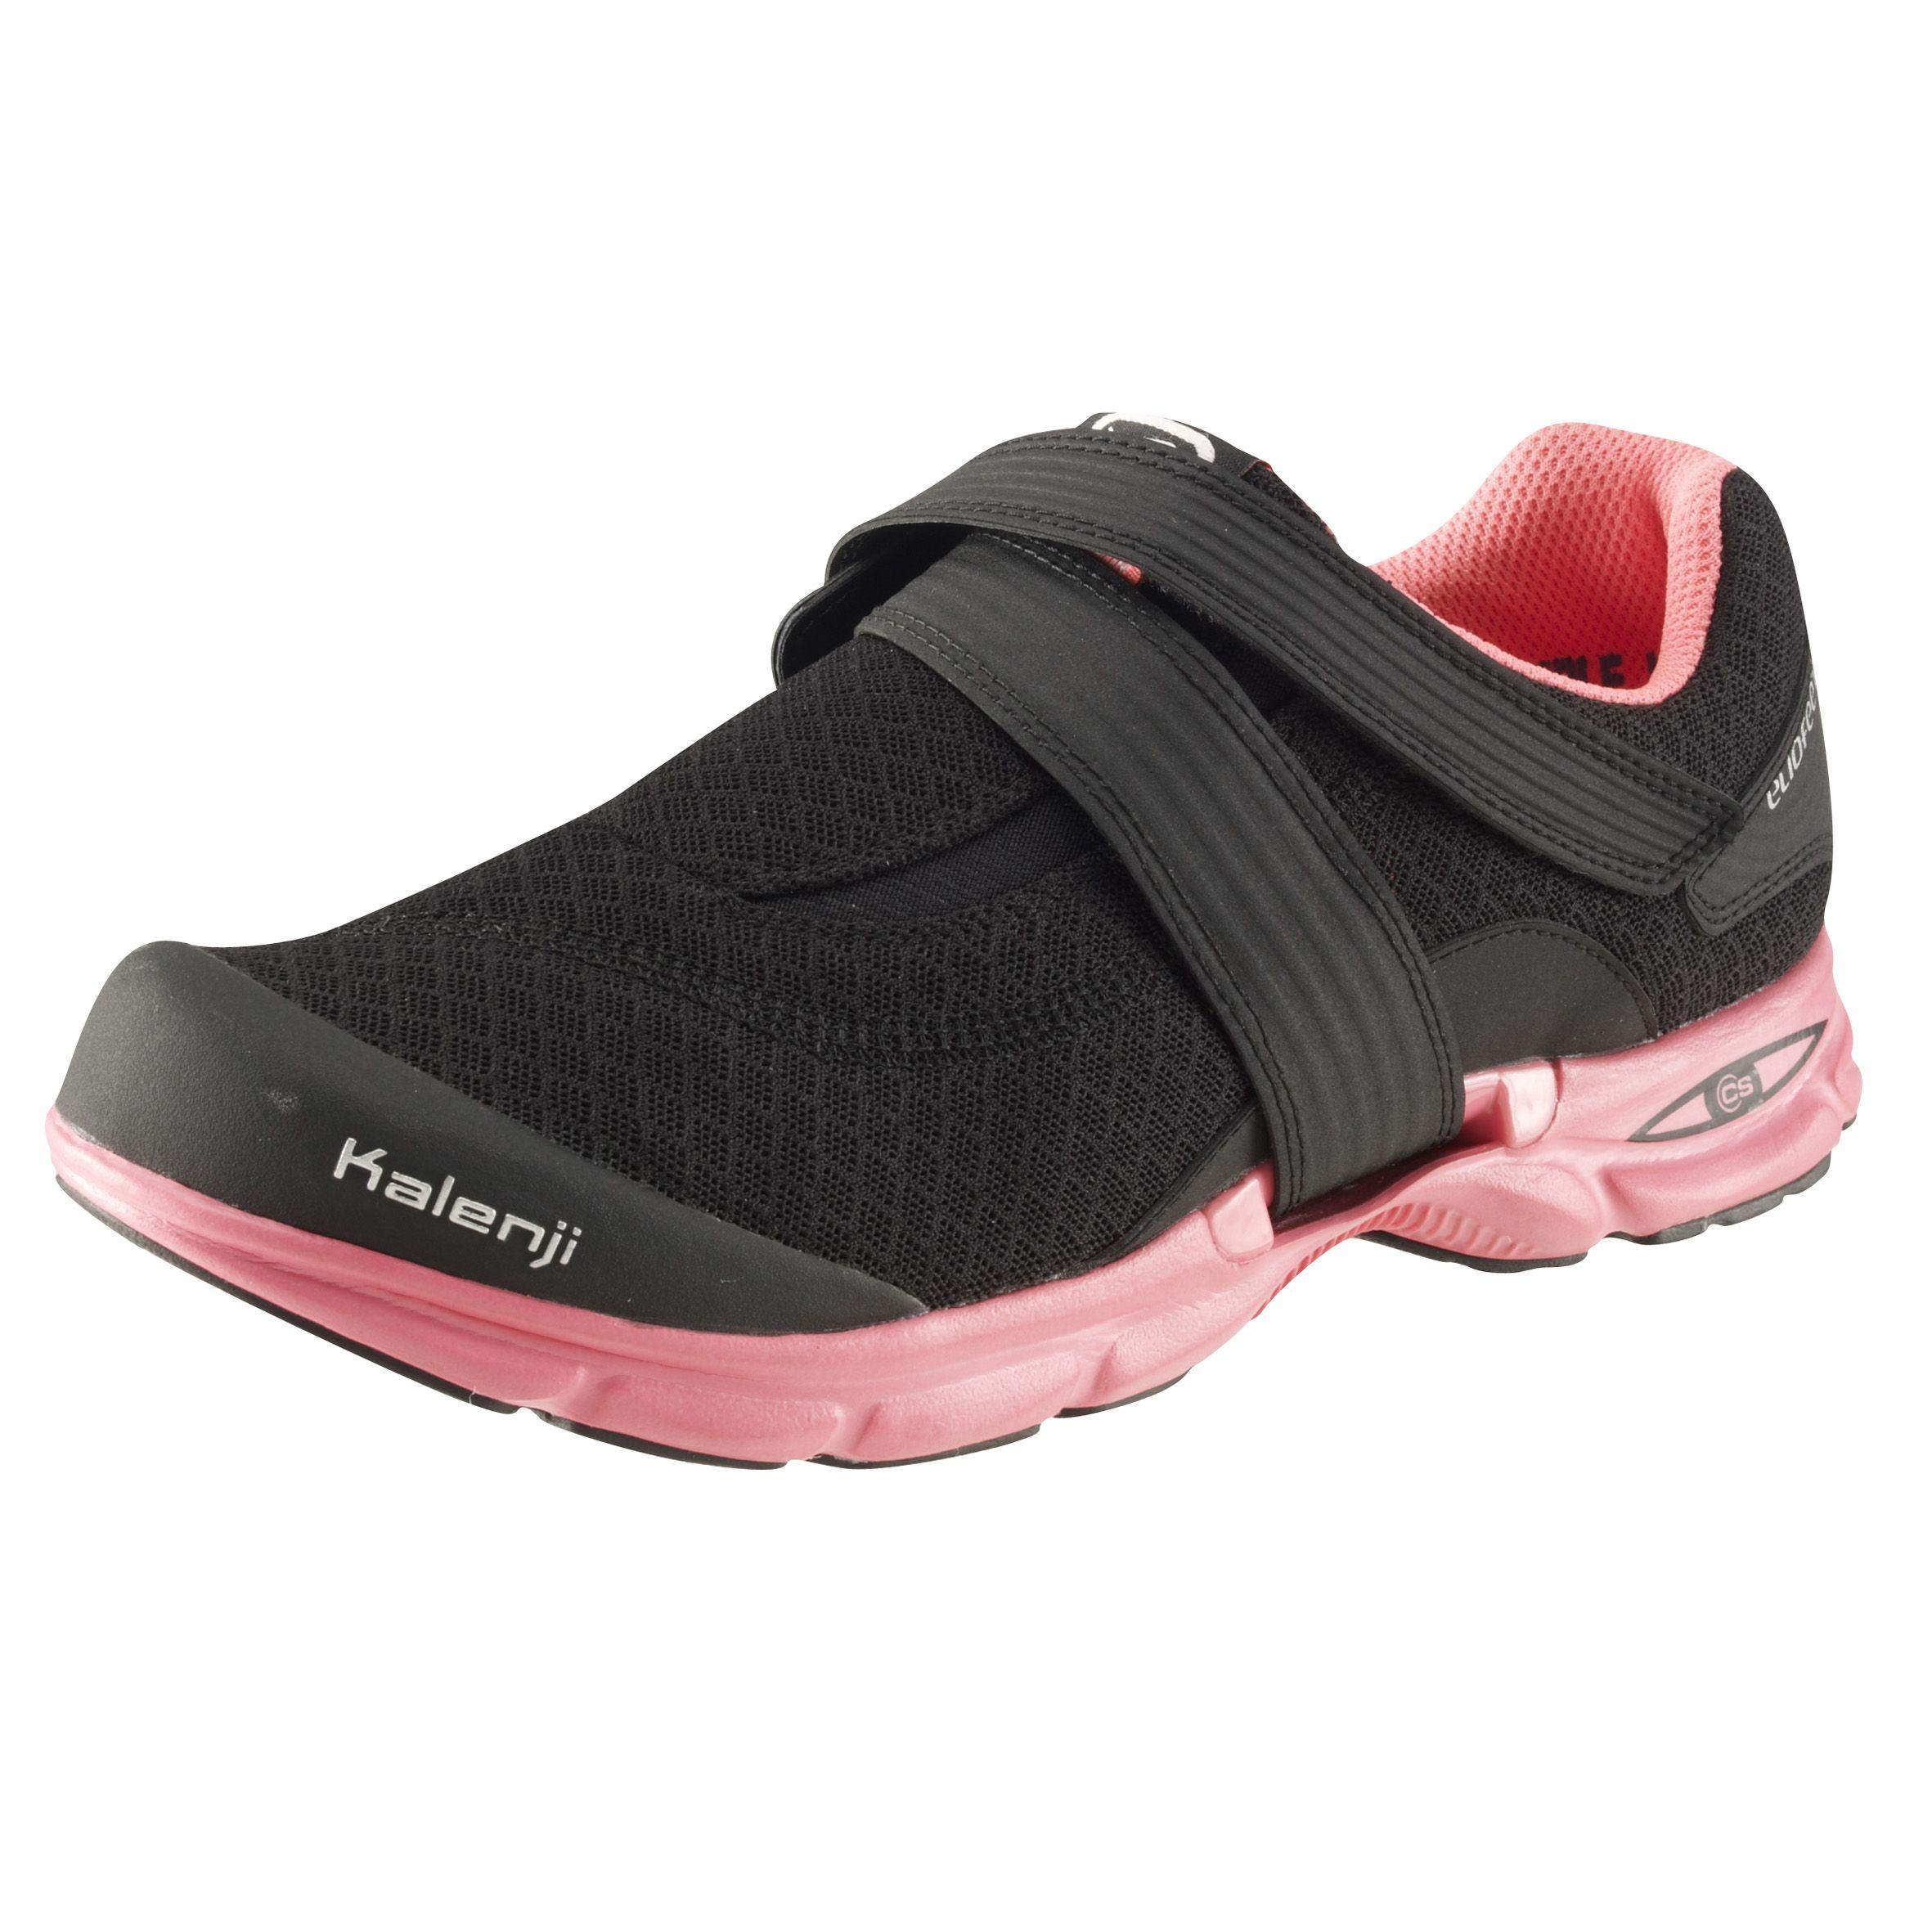 Eliofeet black pink